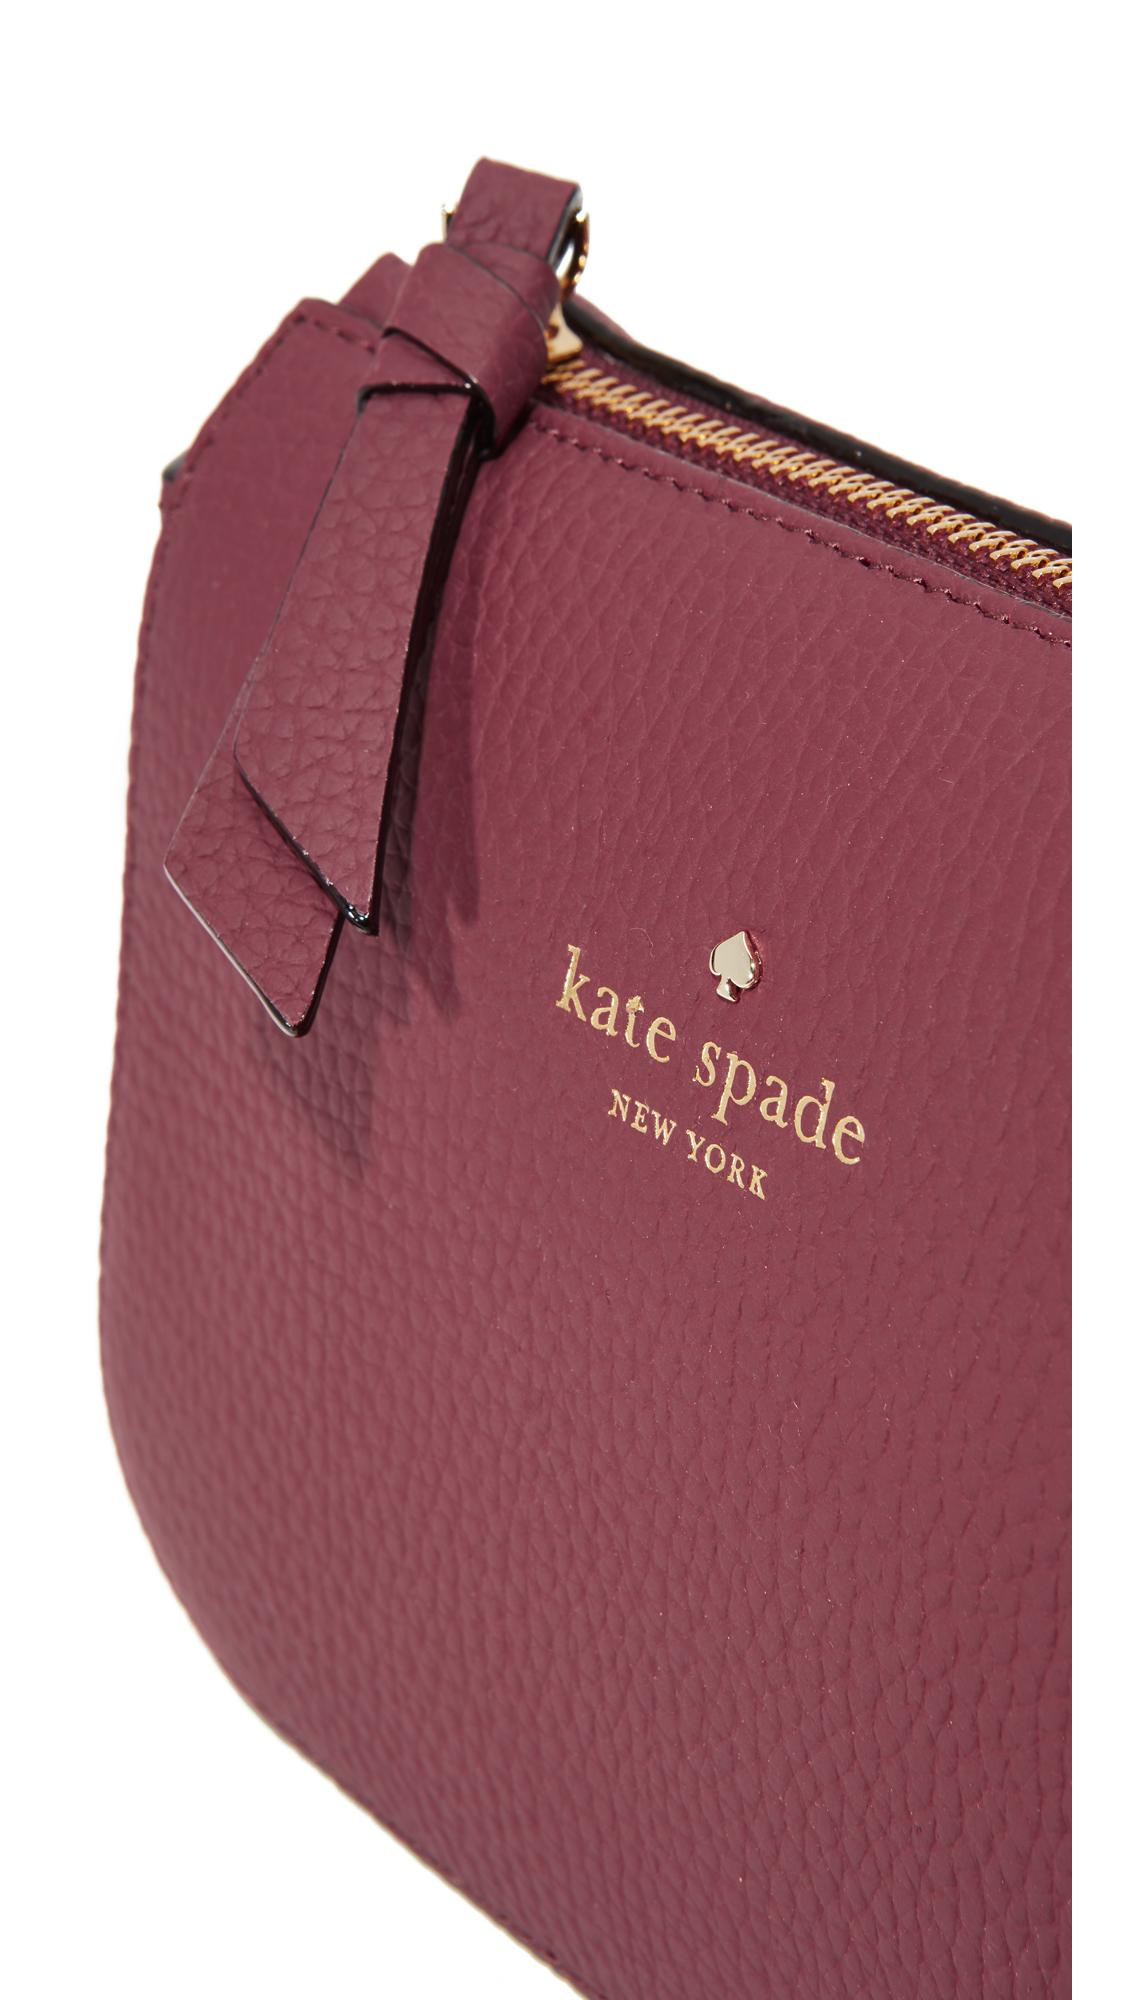 Kate Spade Leather Wendi Cross Body Bag